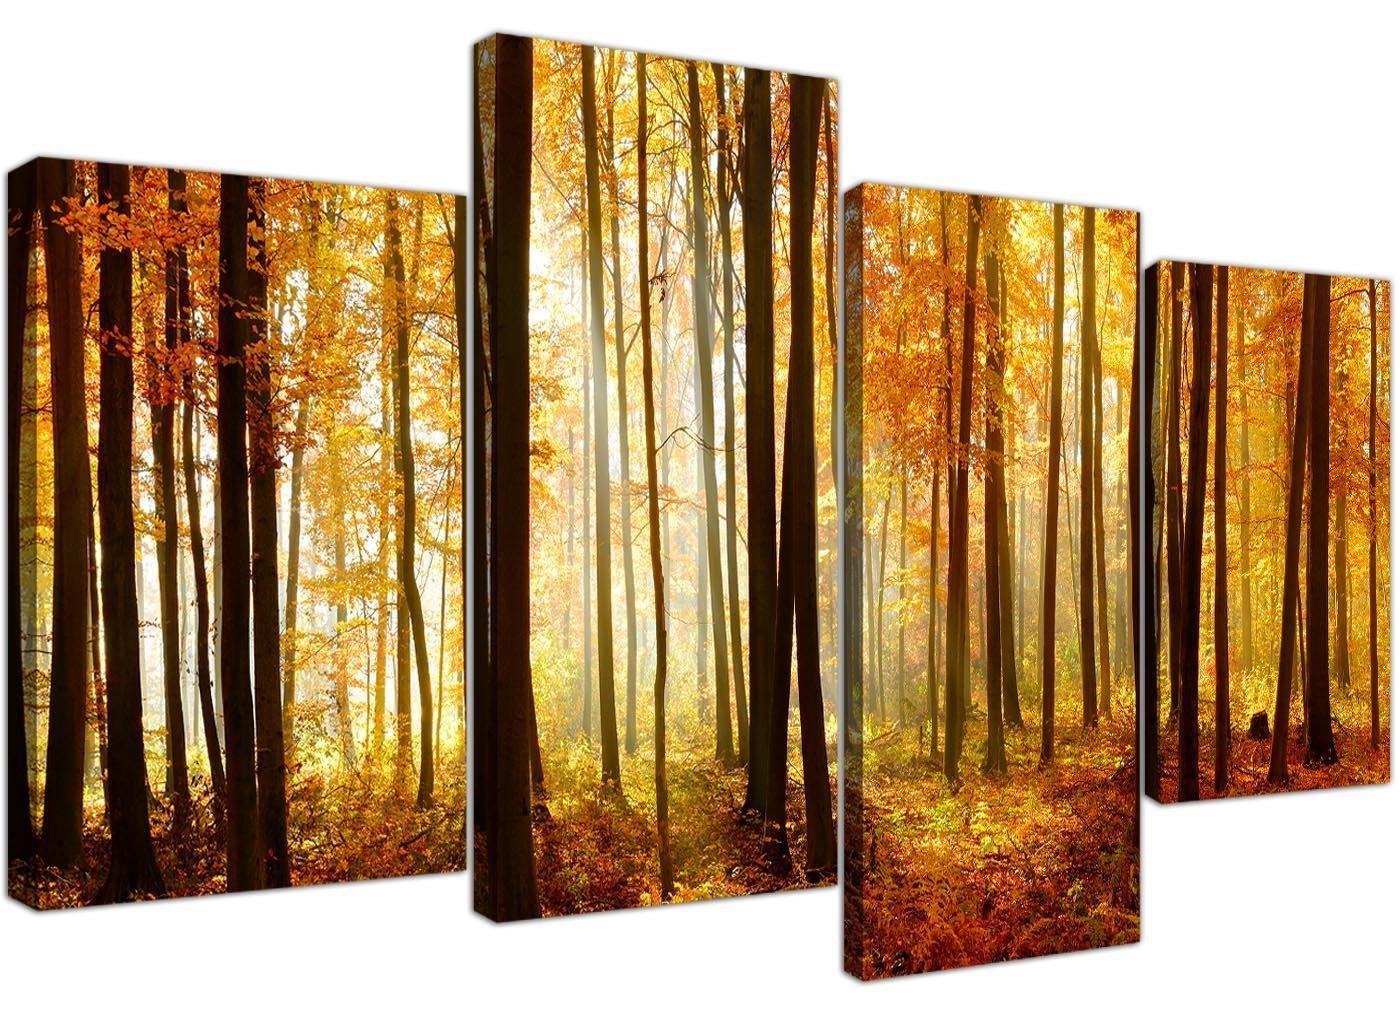 Amazon.com: Orange Autumn Forest Scene Woodland Trees Canvas - Split ...